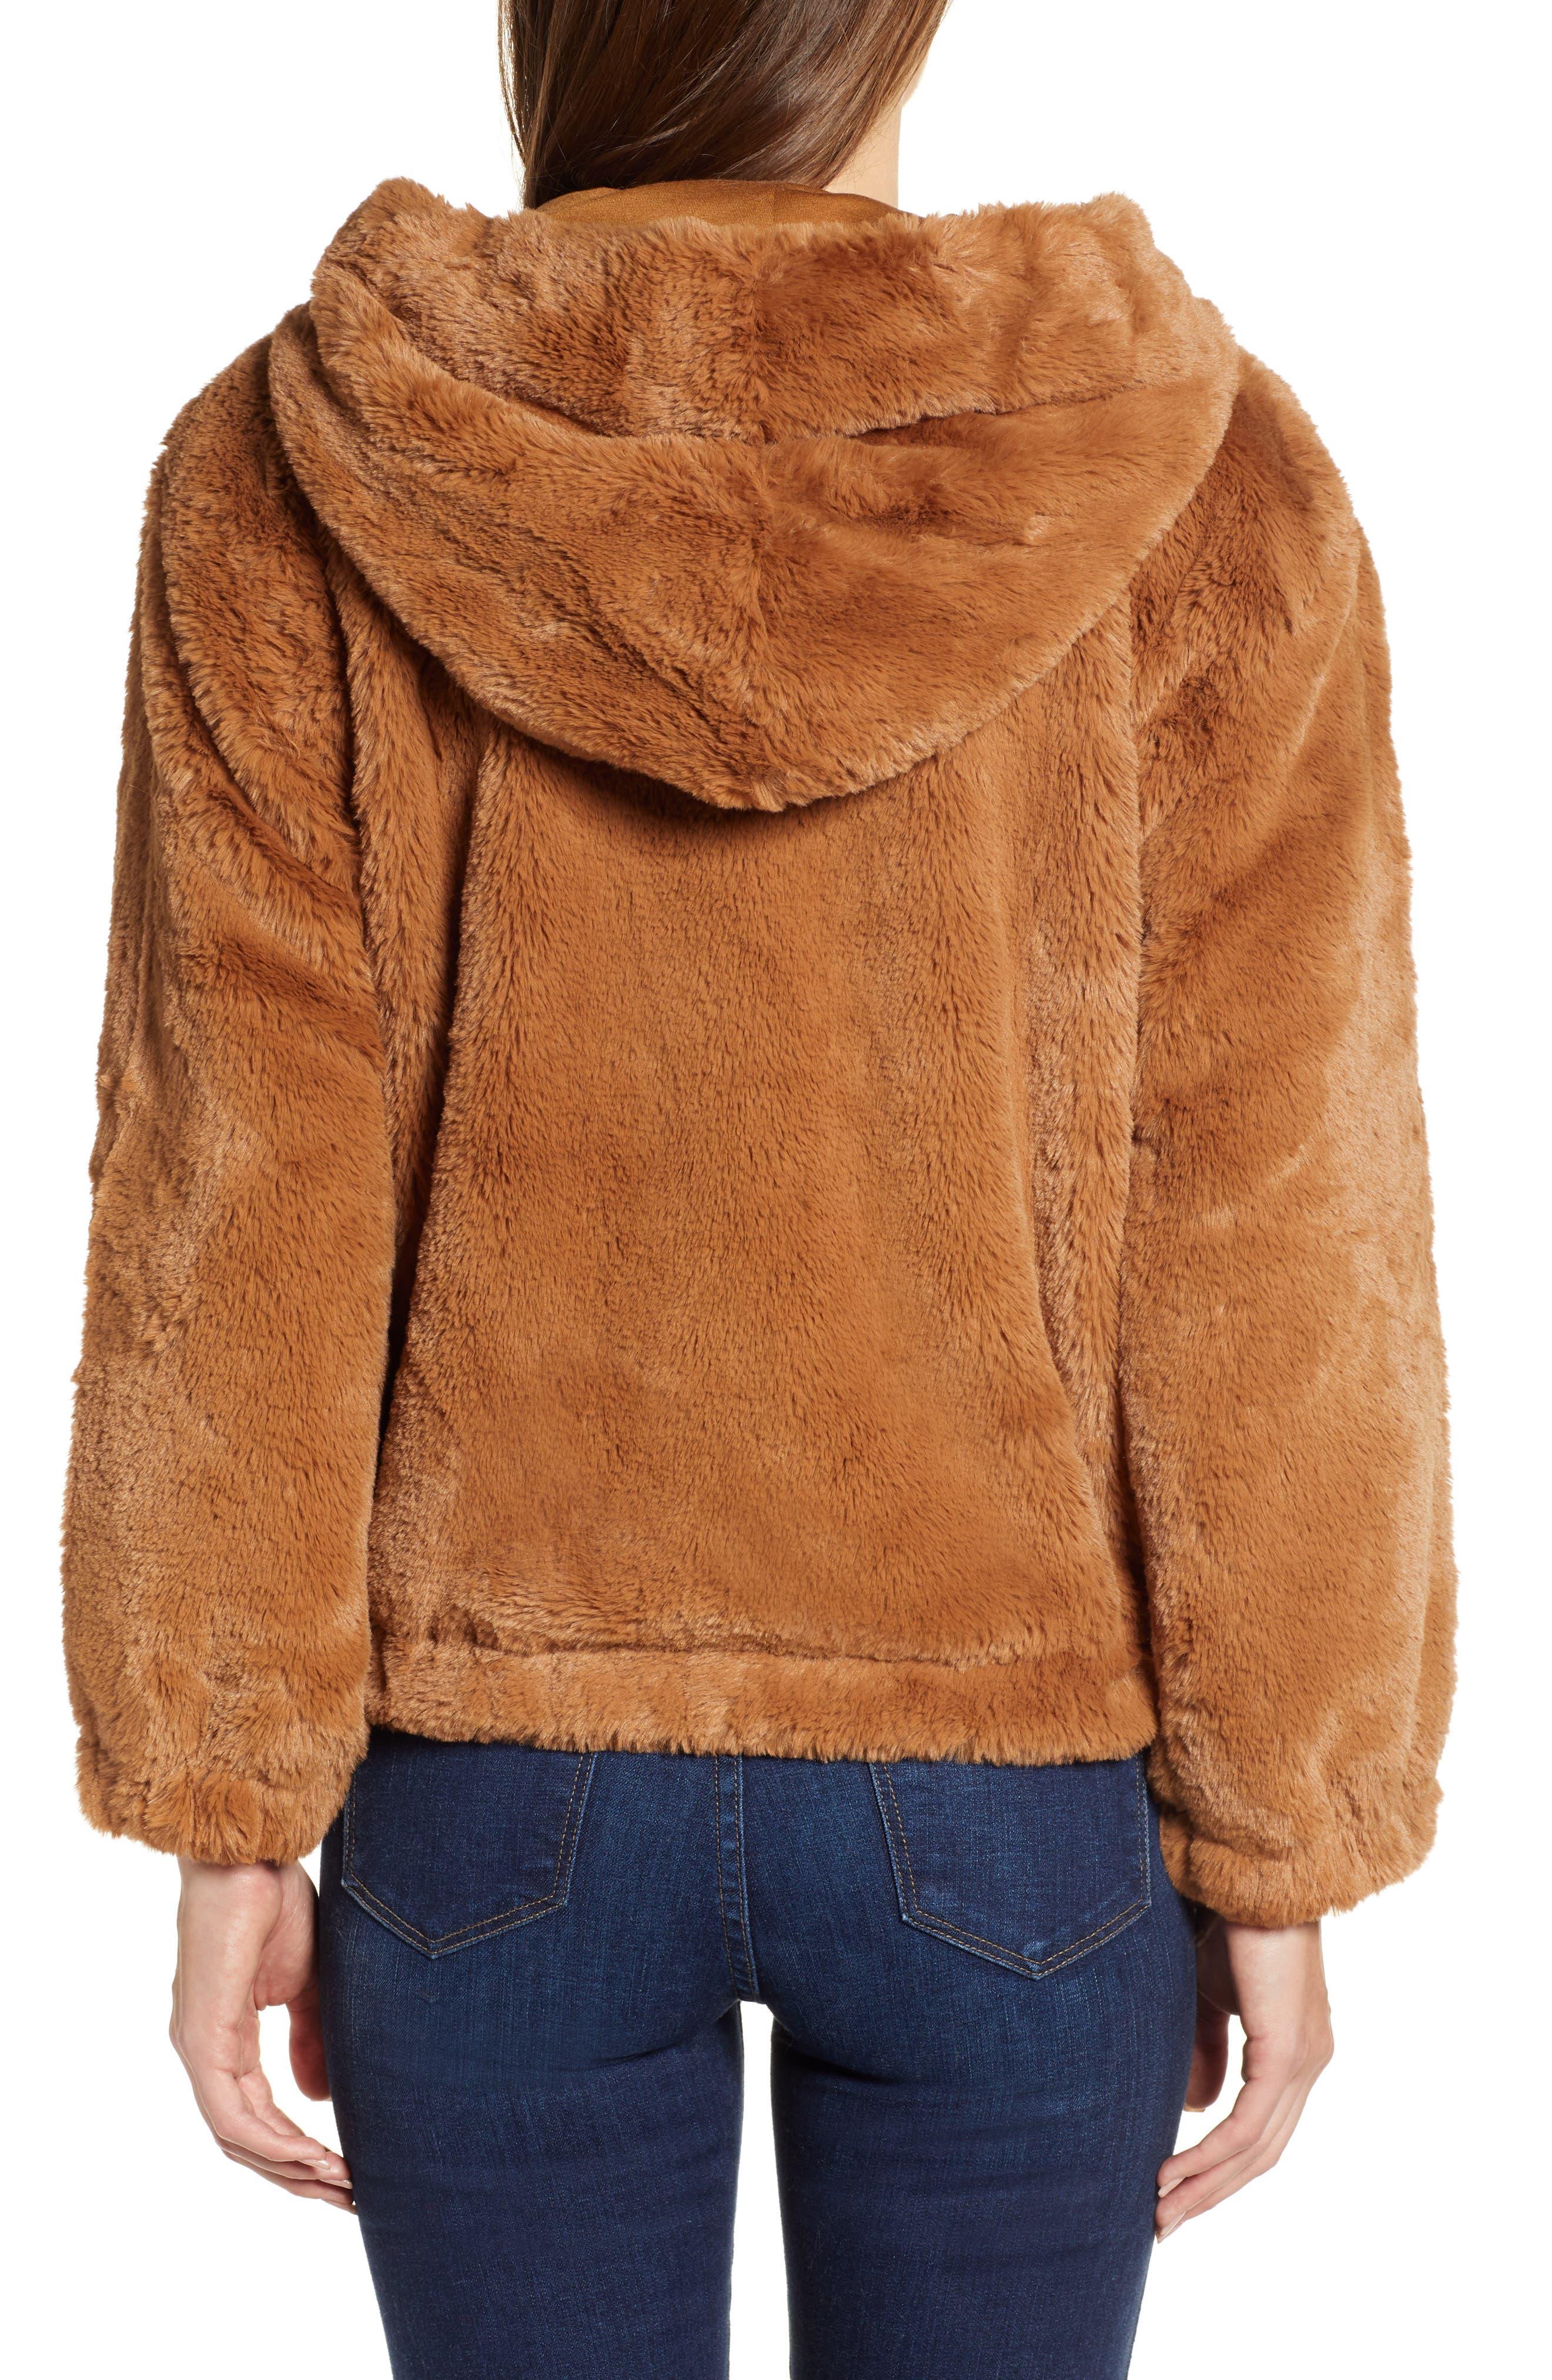 Arabella Faux Shearling Jacket,                             Alternate thumbnail 2, color,                             200